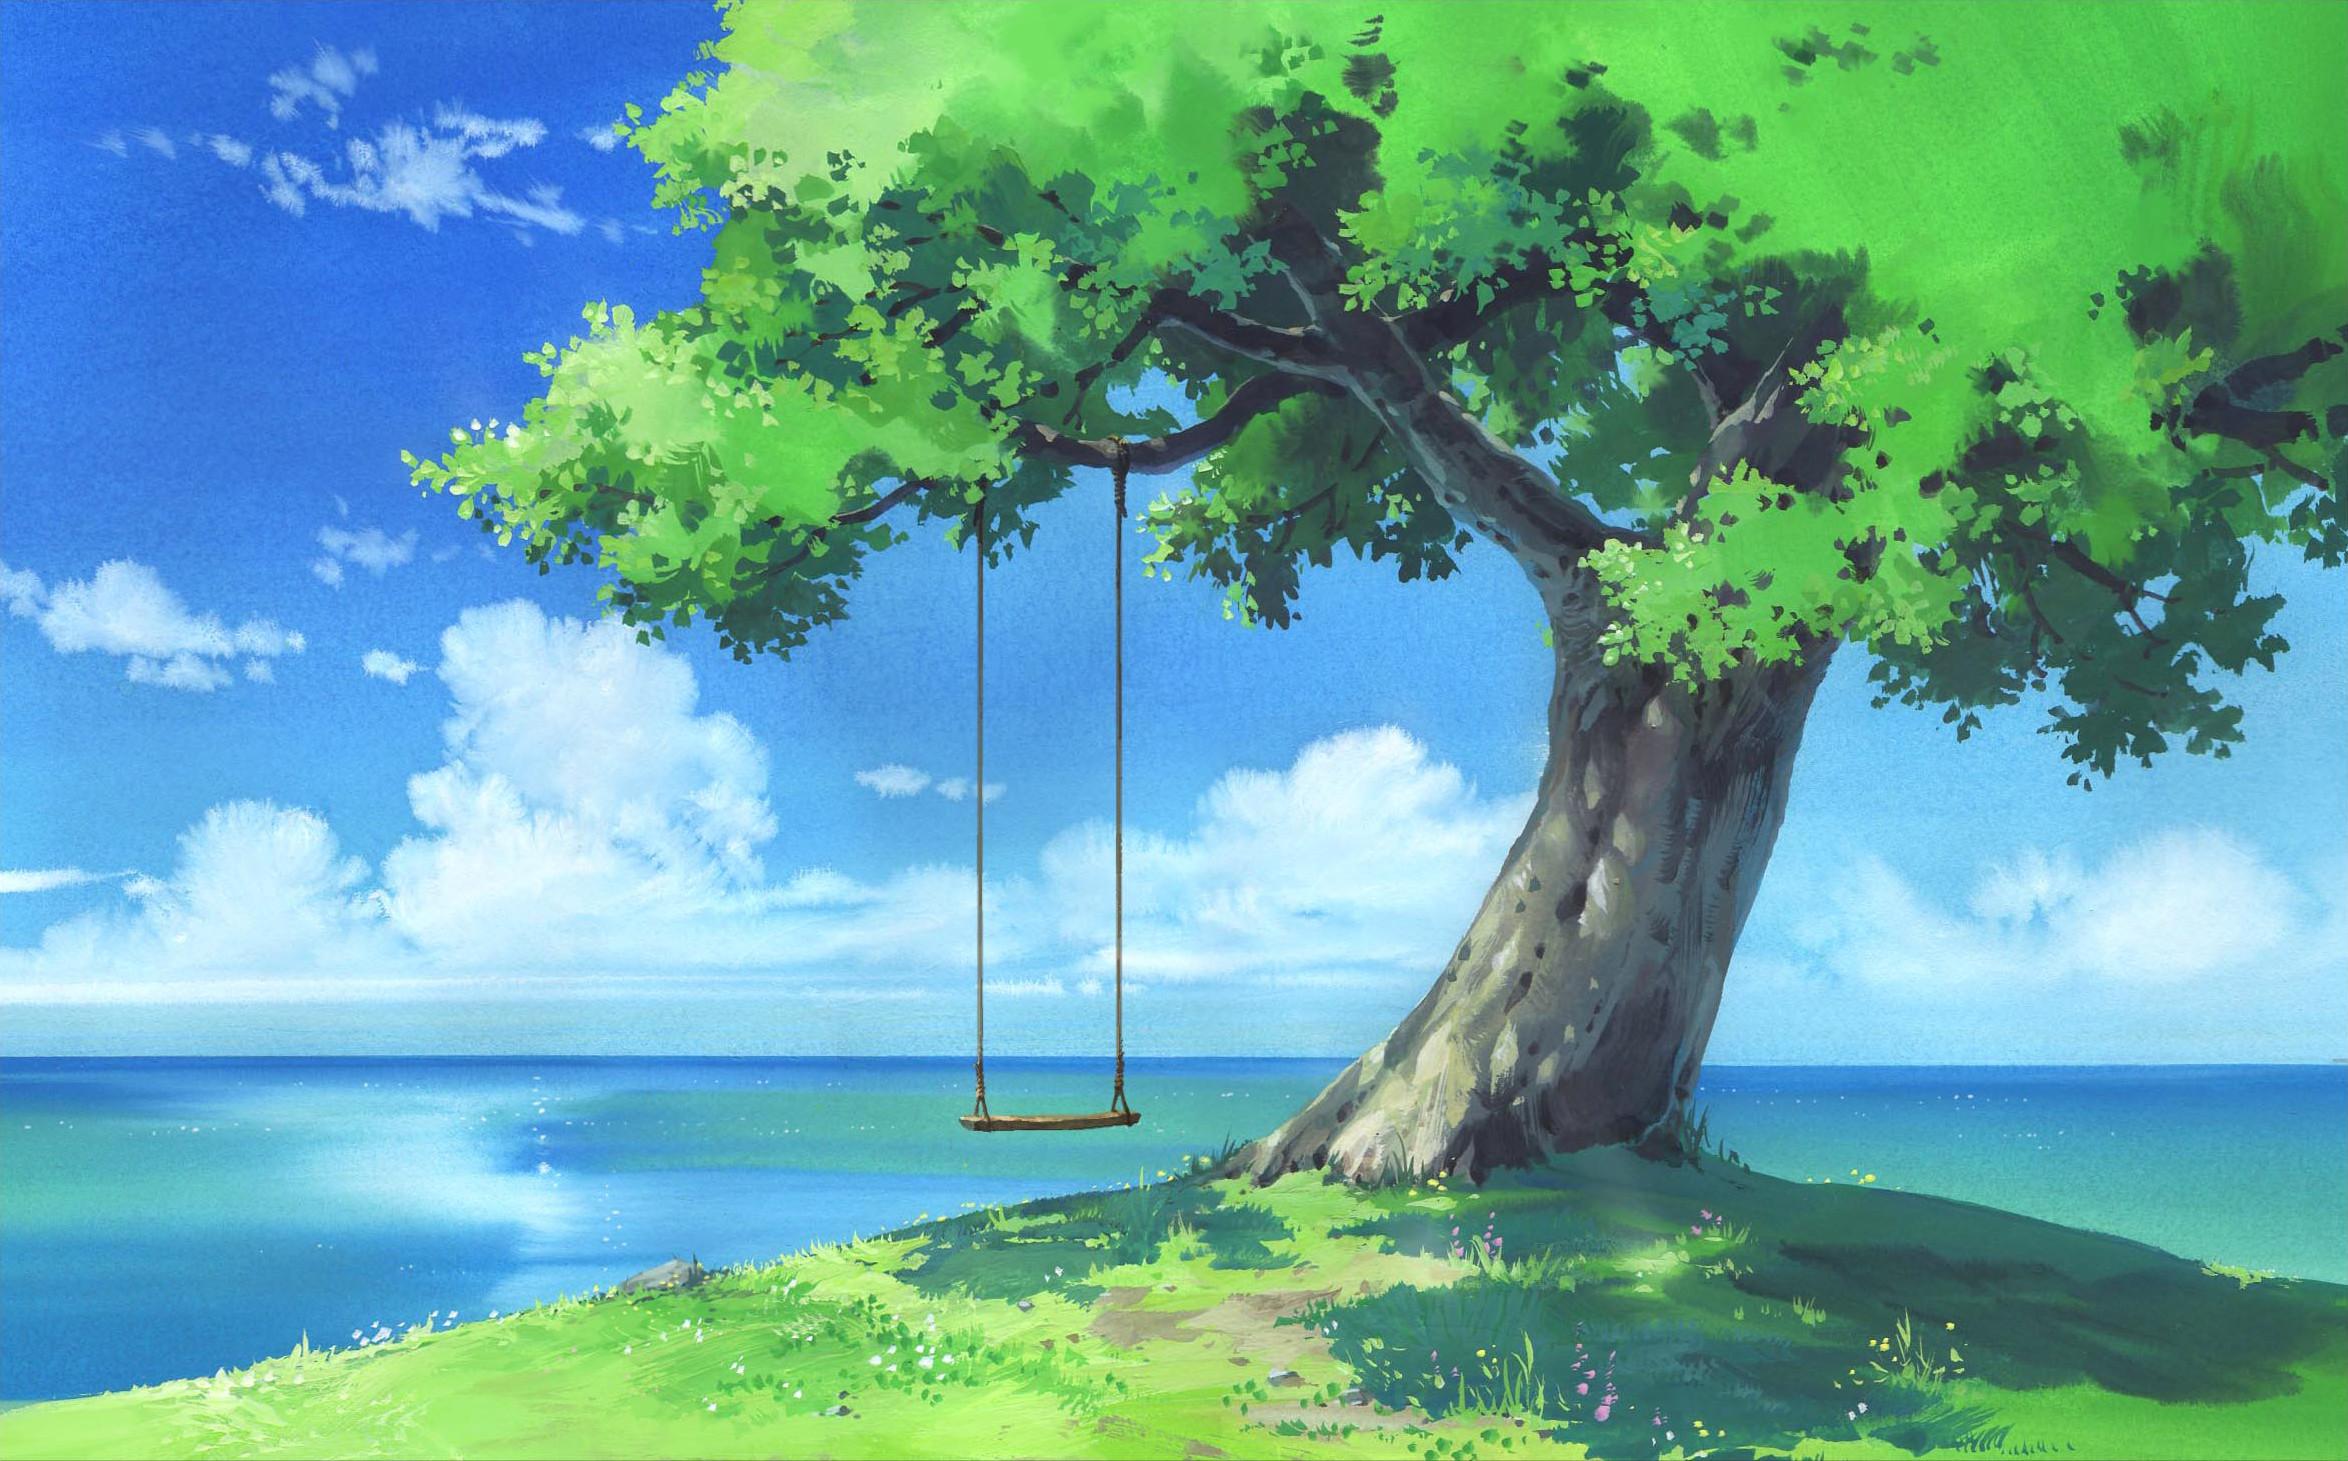 Anime Scenery wallpaper